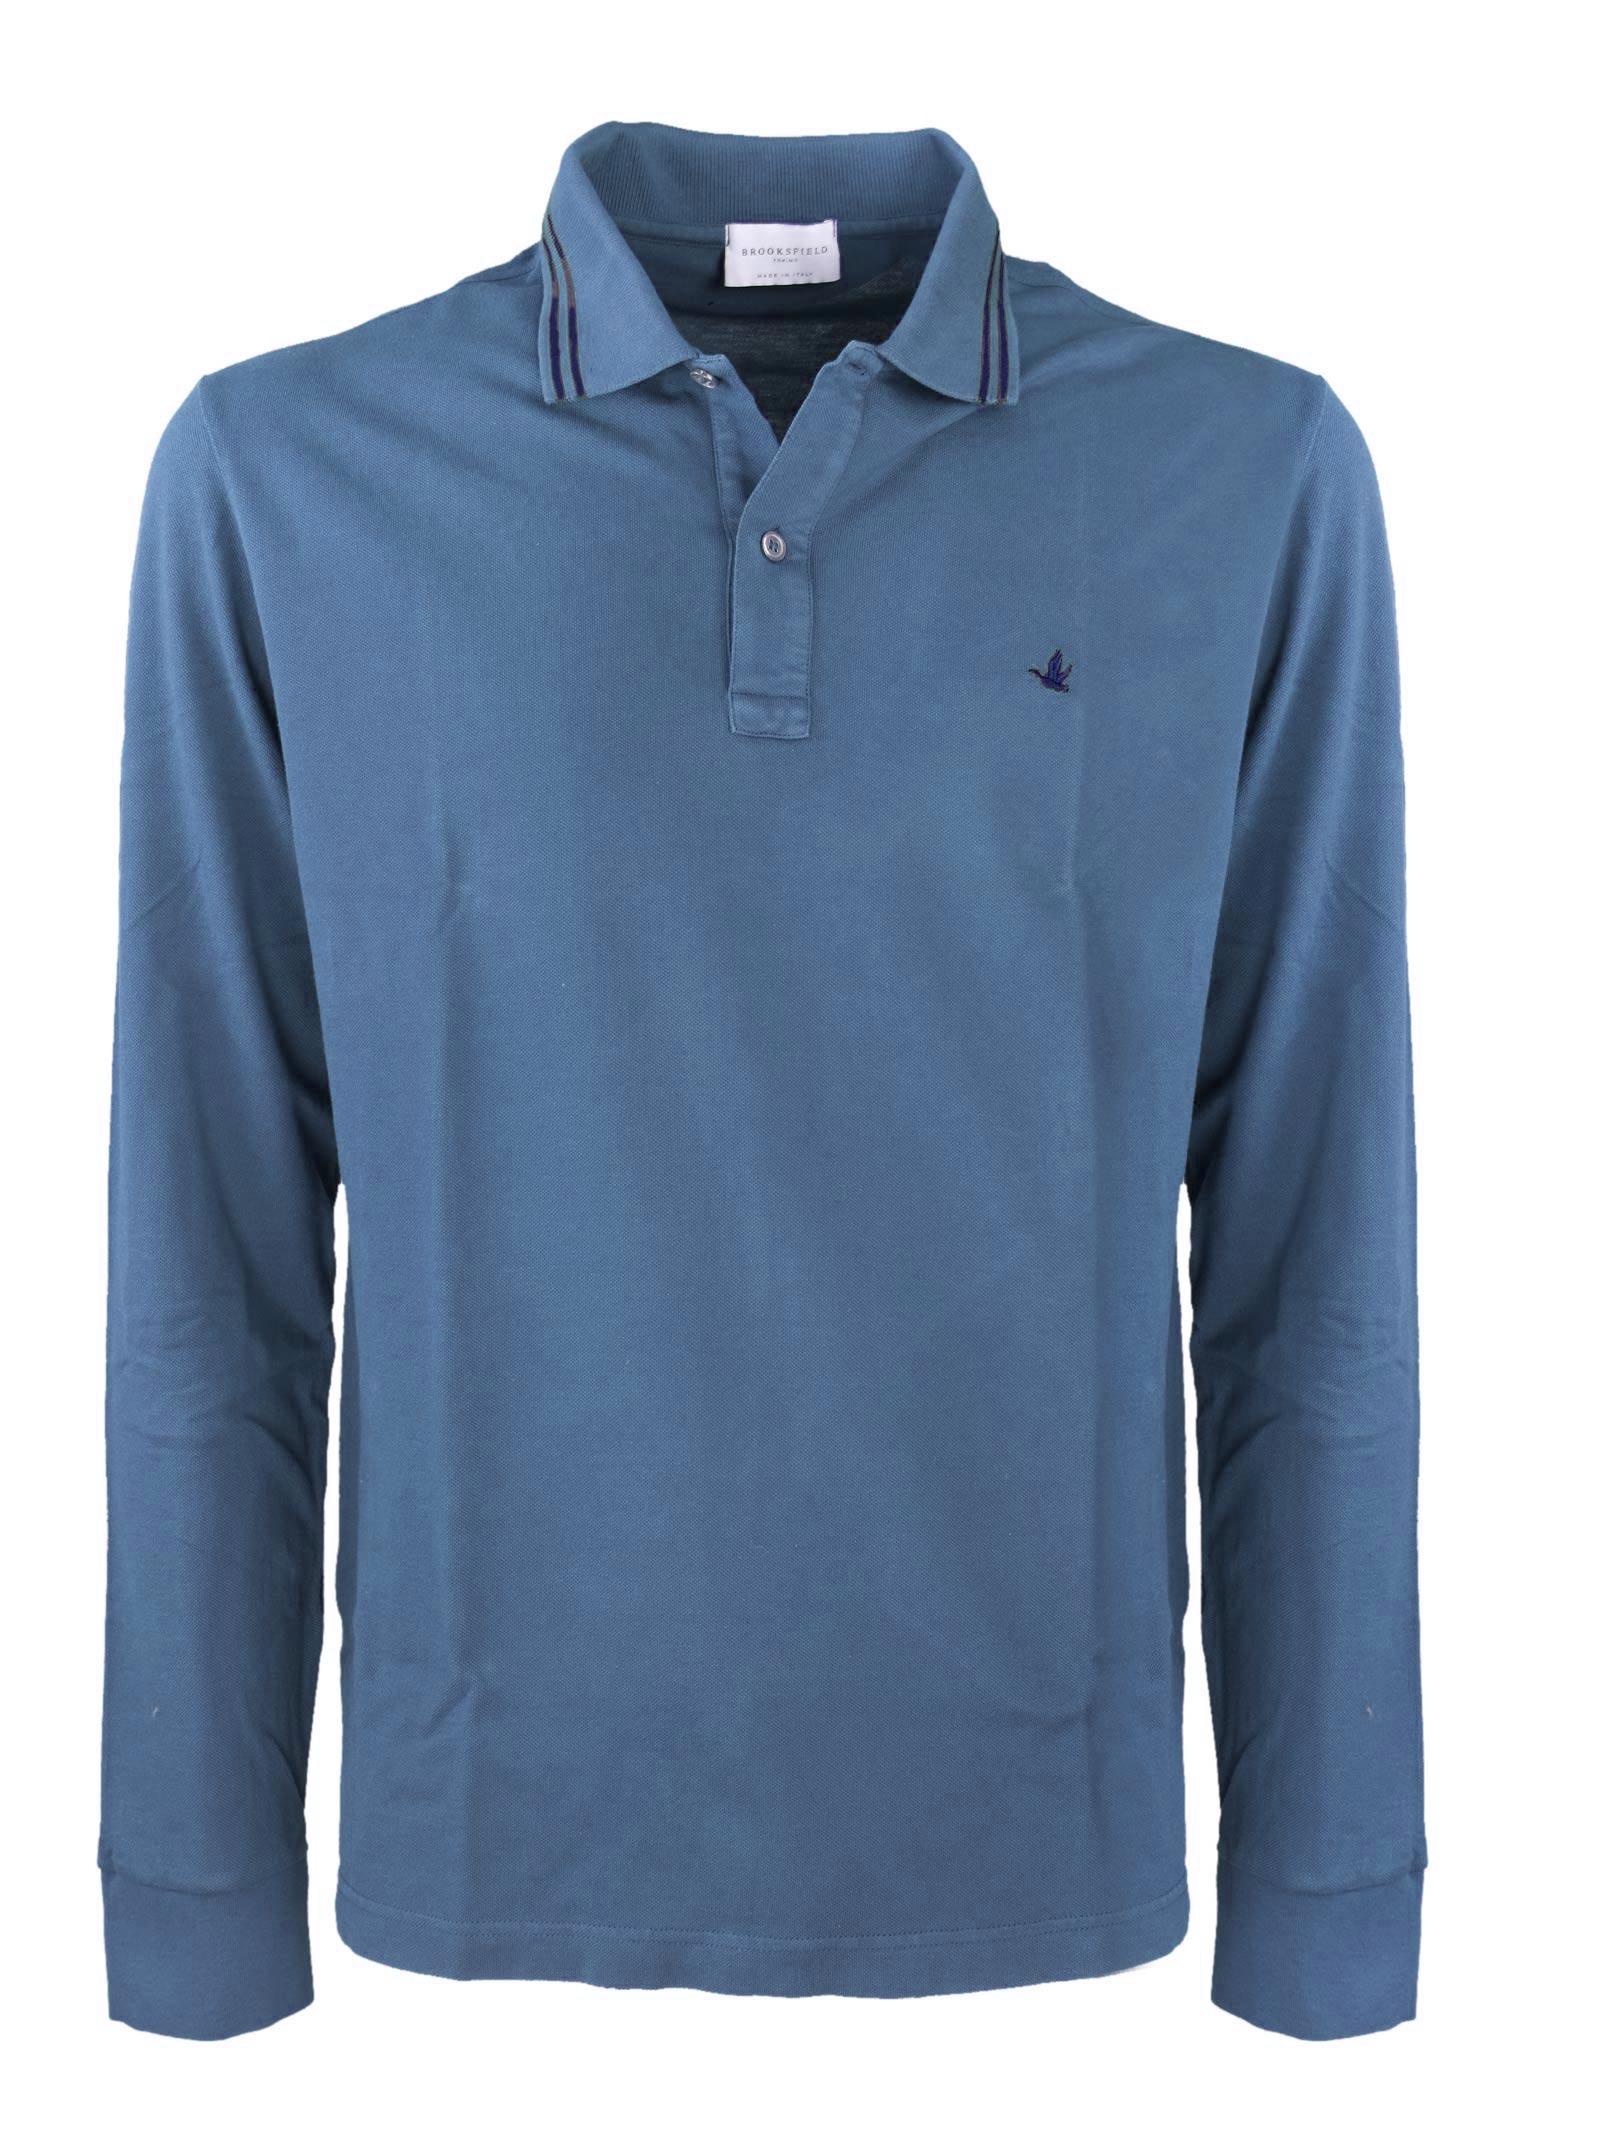 Polo shirt, long sleeves BROOKSFIELD | Polos | 201B.A0240079